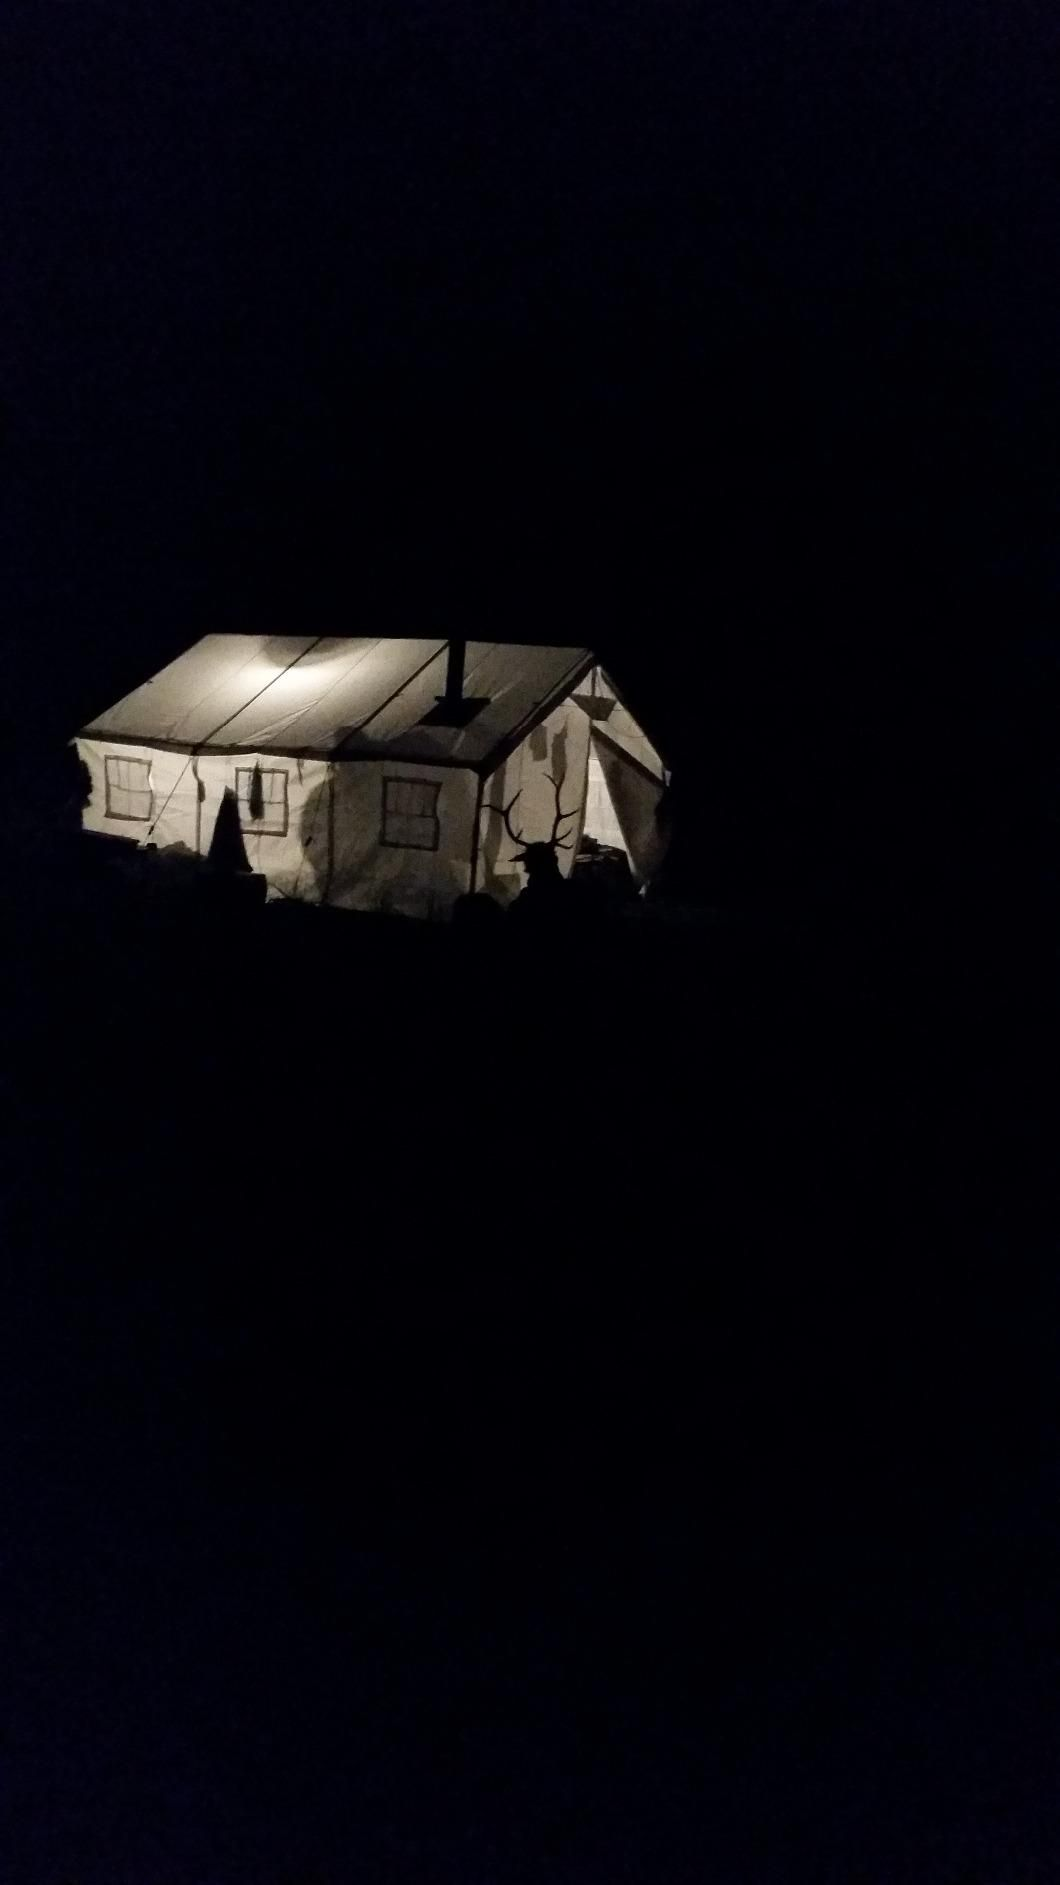 Amazon.com: Customer Reviews: 13 X 20 Canvas Wall Tent & Angle Kit ...